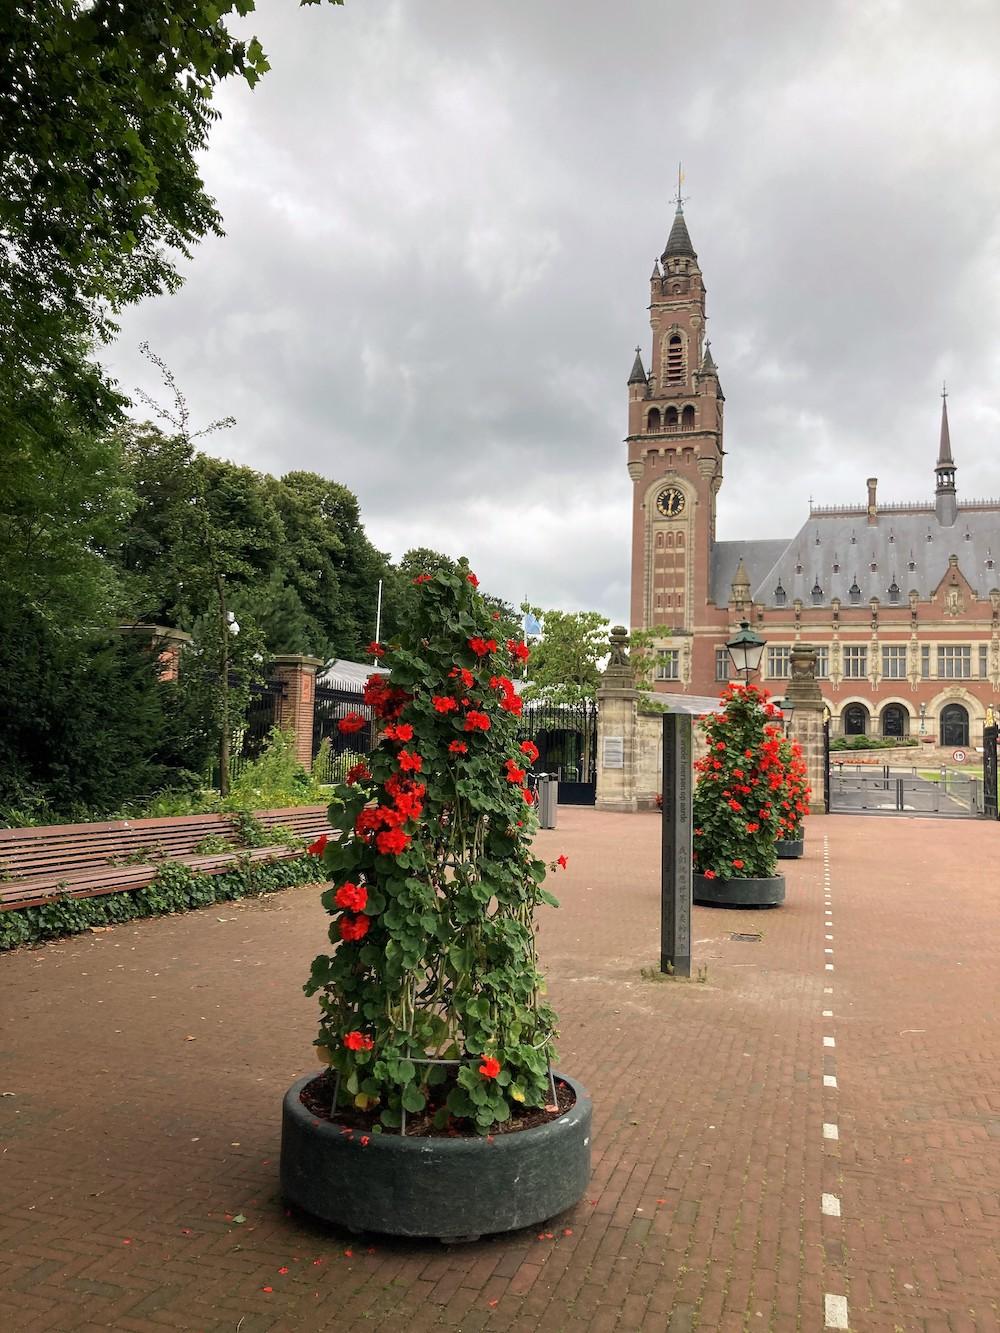 Vredepaleis, Den Haag